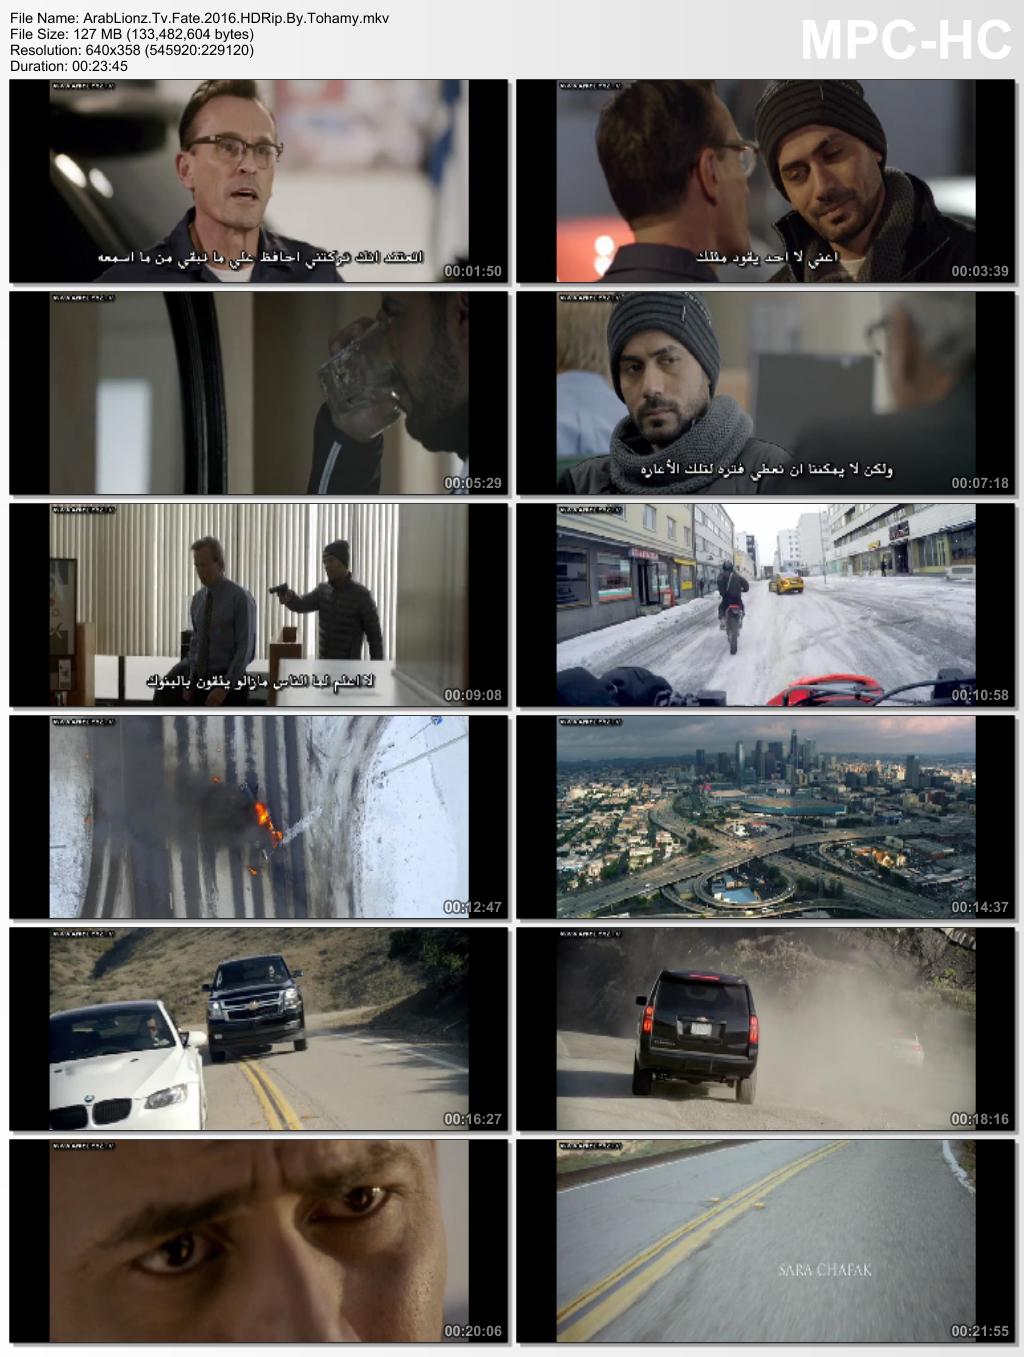 تحميل ومشاهدة  فيلم Fate 2016 HDRip مترجم | مشاهده اون لاين  GCCYFHiC